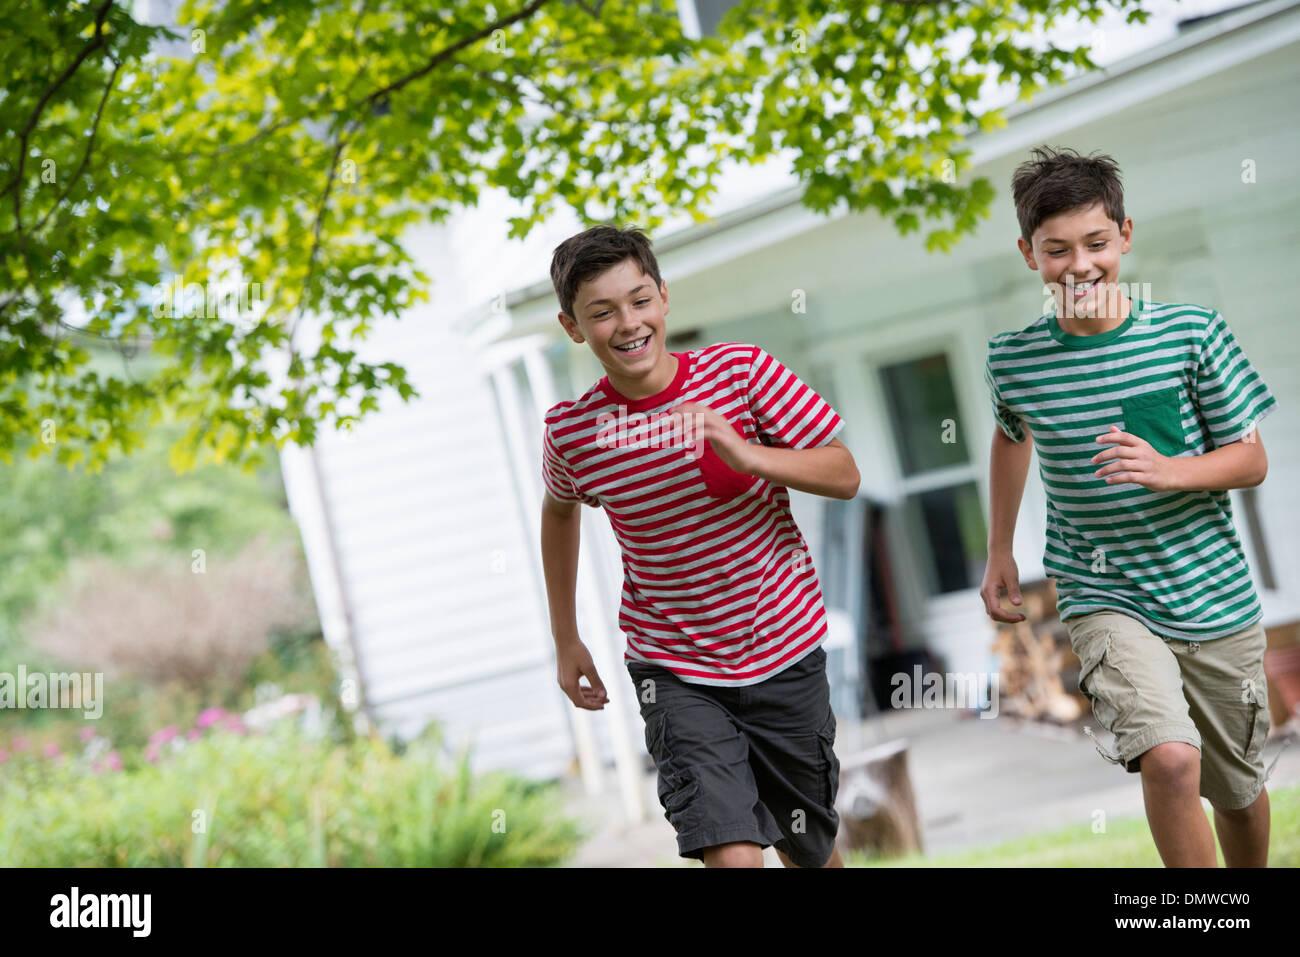 Two boys in a farmhouse garden in summer. - Stock Image